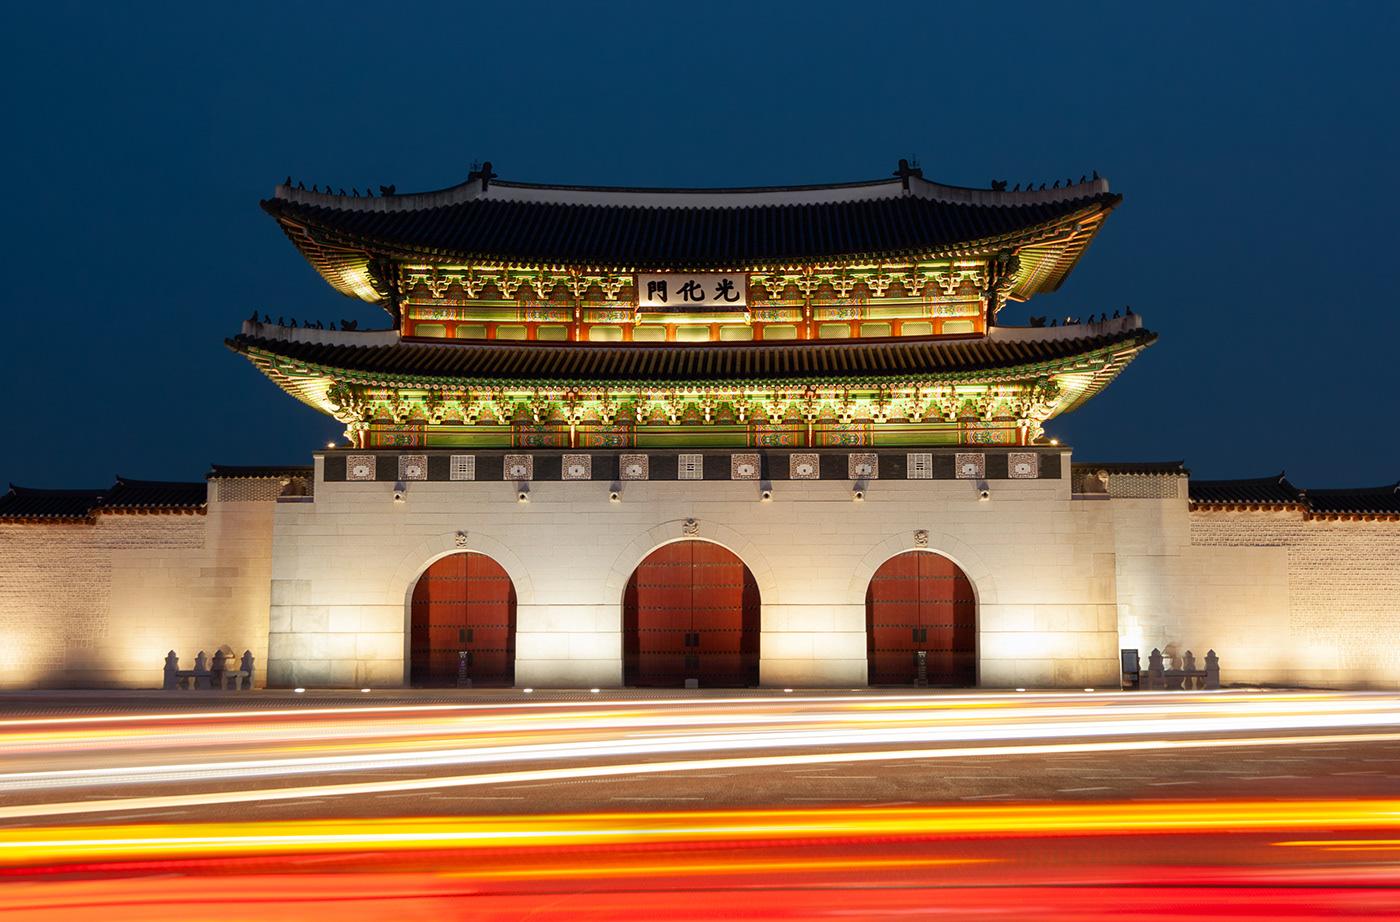 Gwanghwamun- Front gate to Gyeongbokgung Palace in Seoul, South Korea.